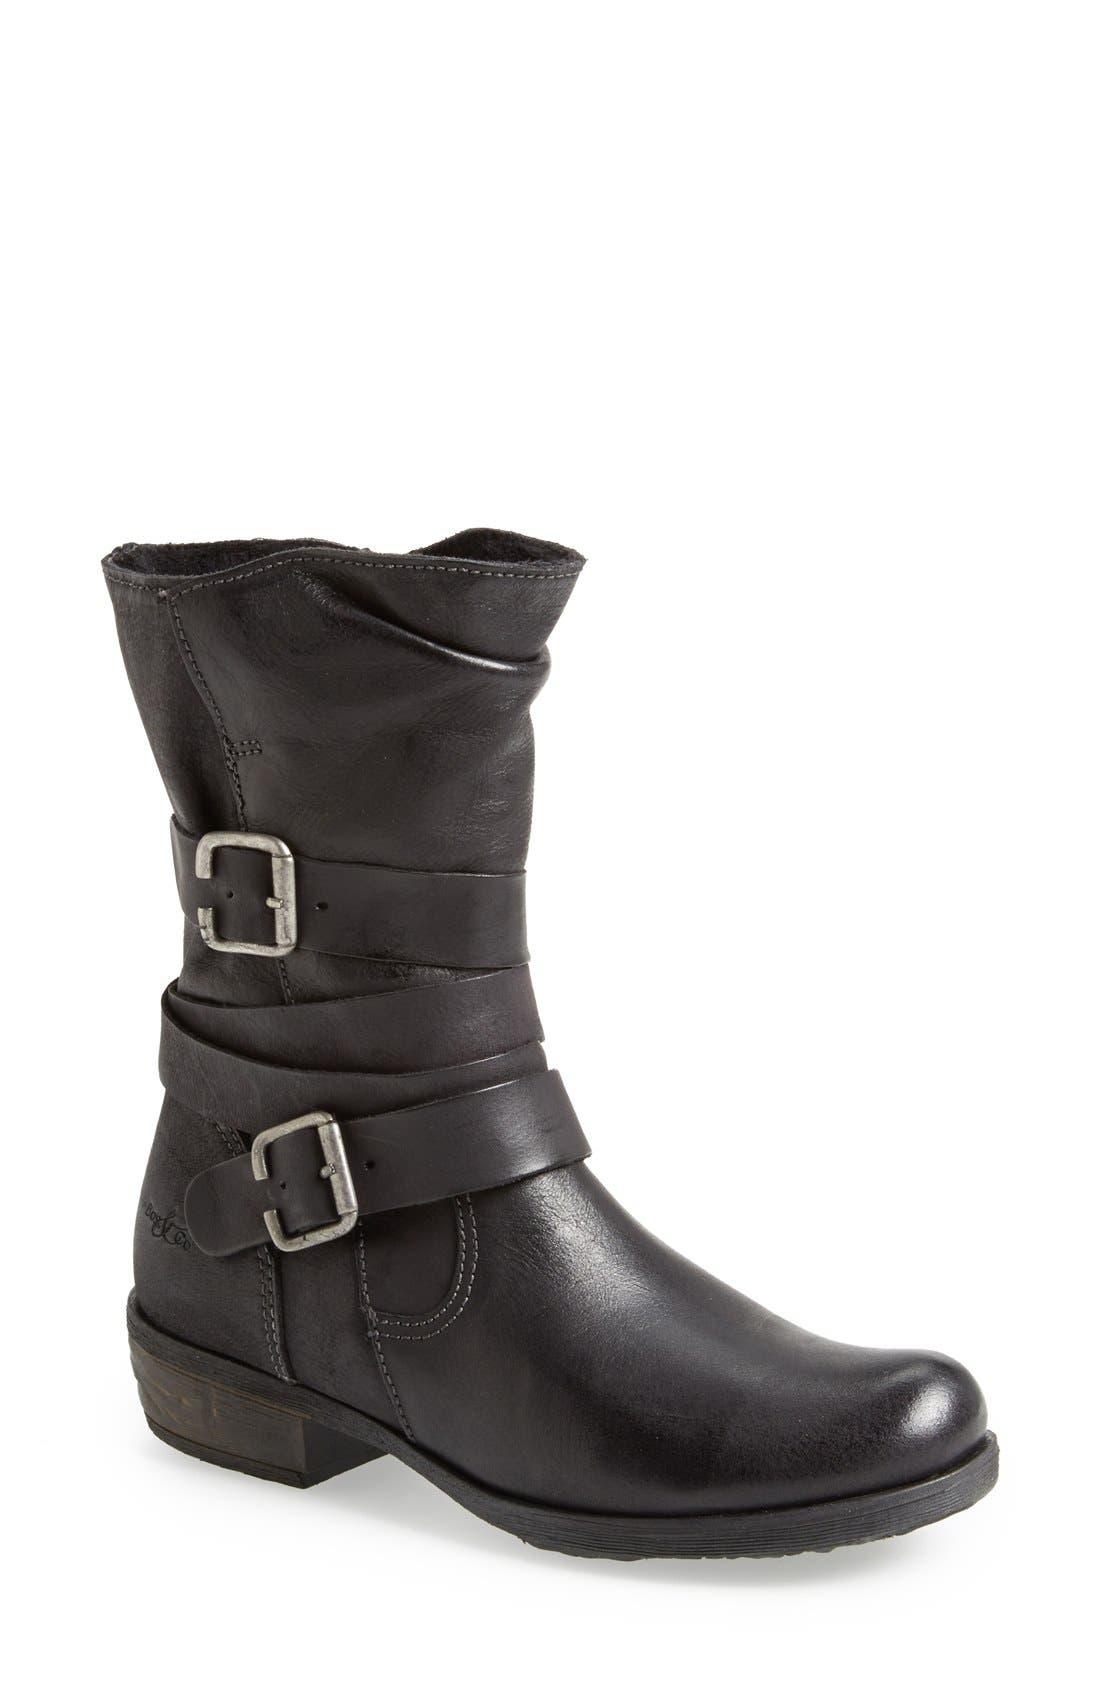 Main Image - Bos. & Co. 'Katie' Waterproof Leather Moto Boot (Women)